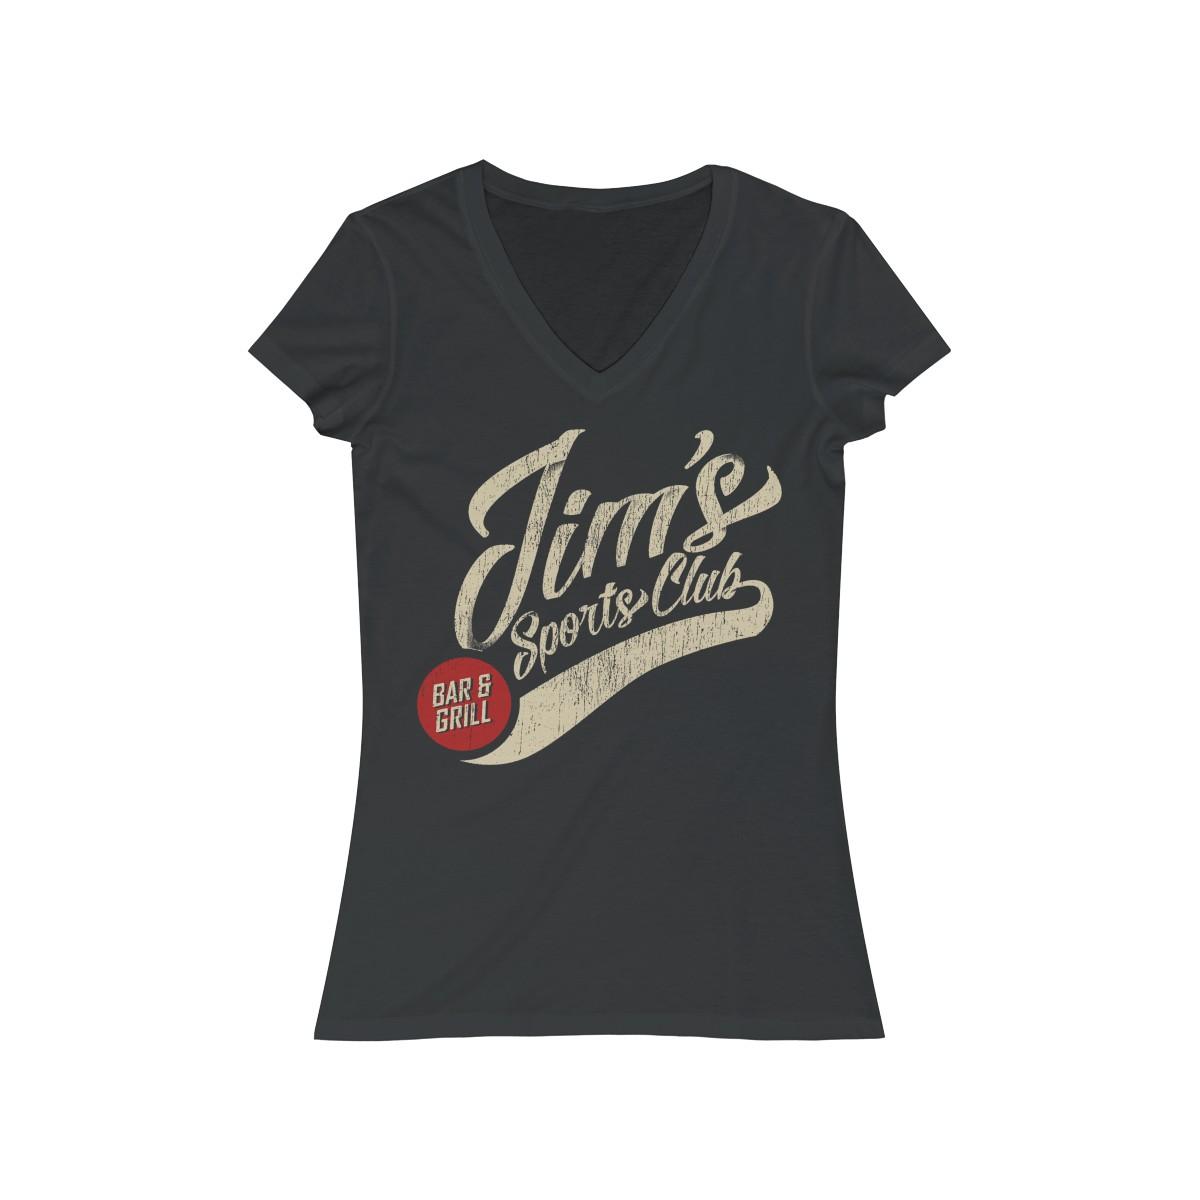 Dark Grey Heather Women's Jersey Short Sleeve V-Neck Tee